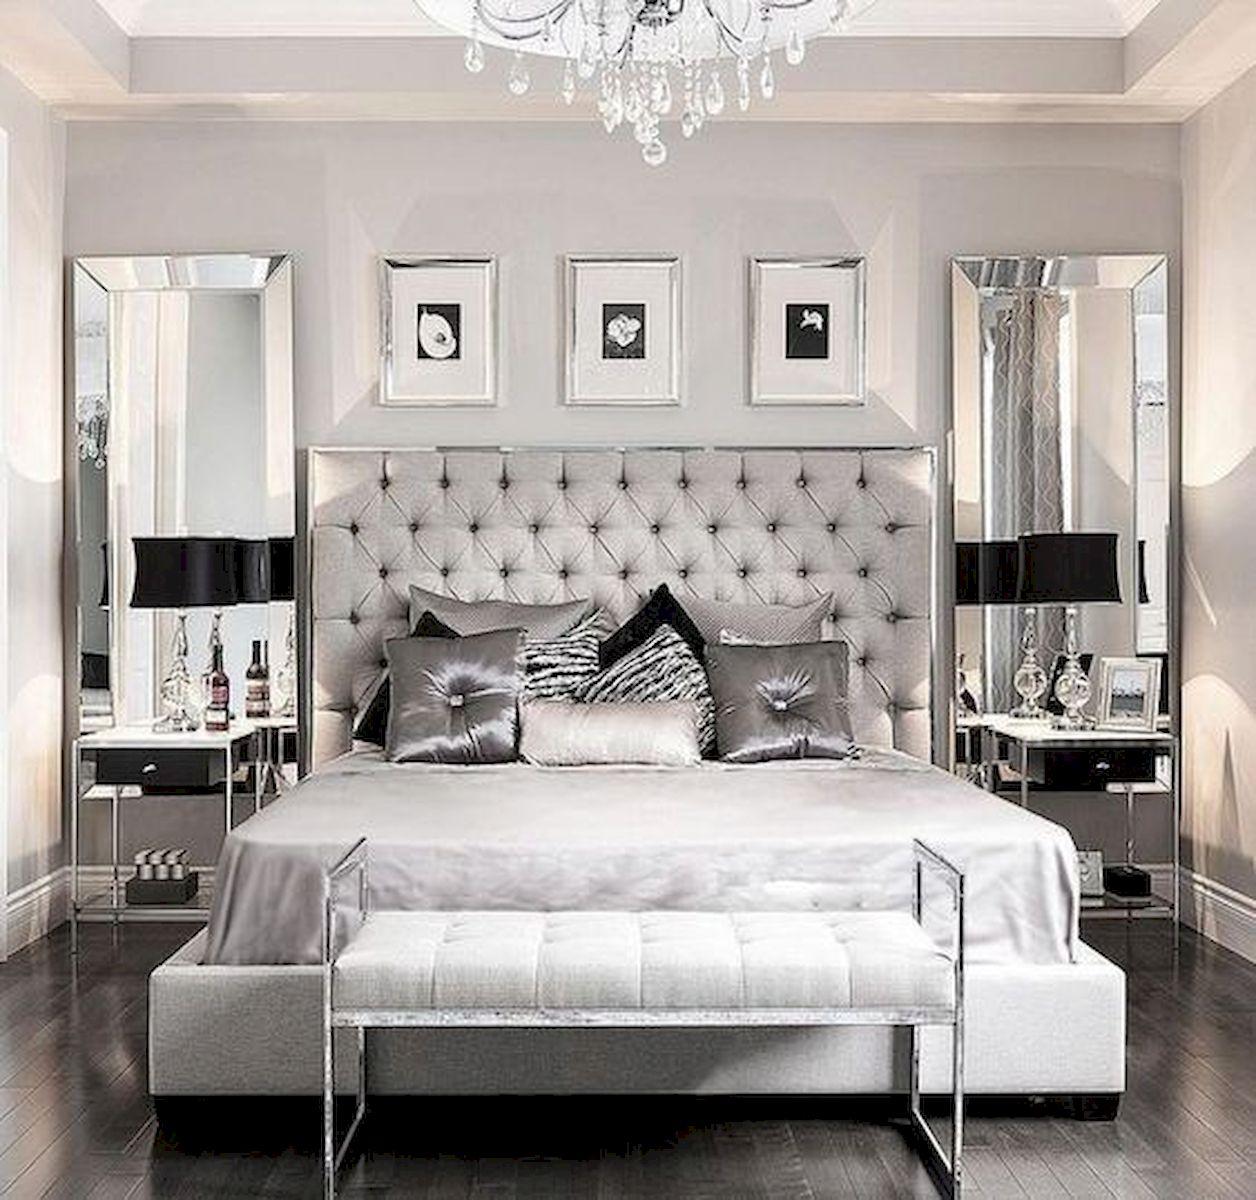 50 Amazing Modern Bedroom Decoration Ideas With Luxury Design House8055 Com